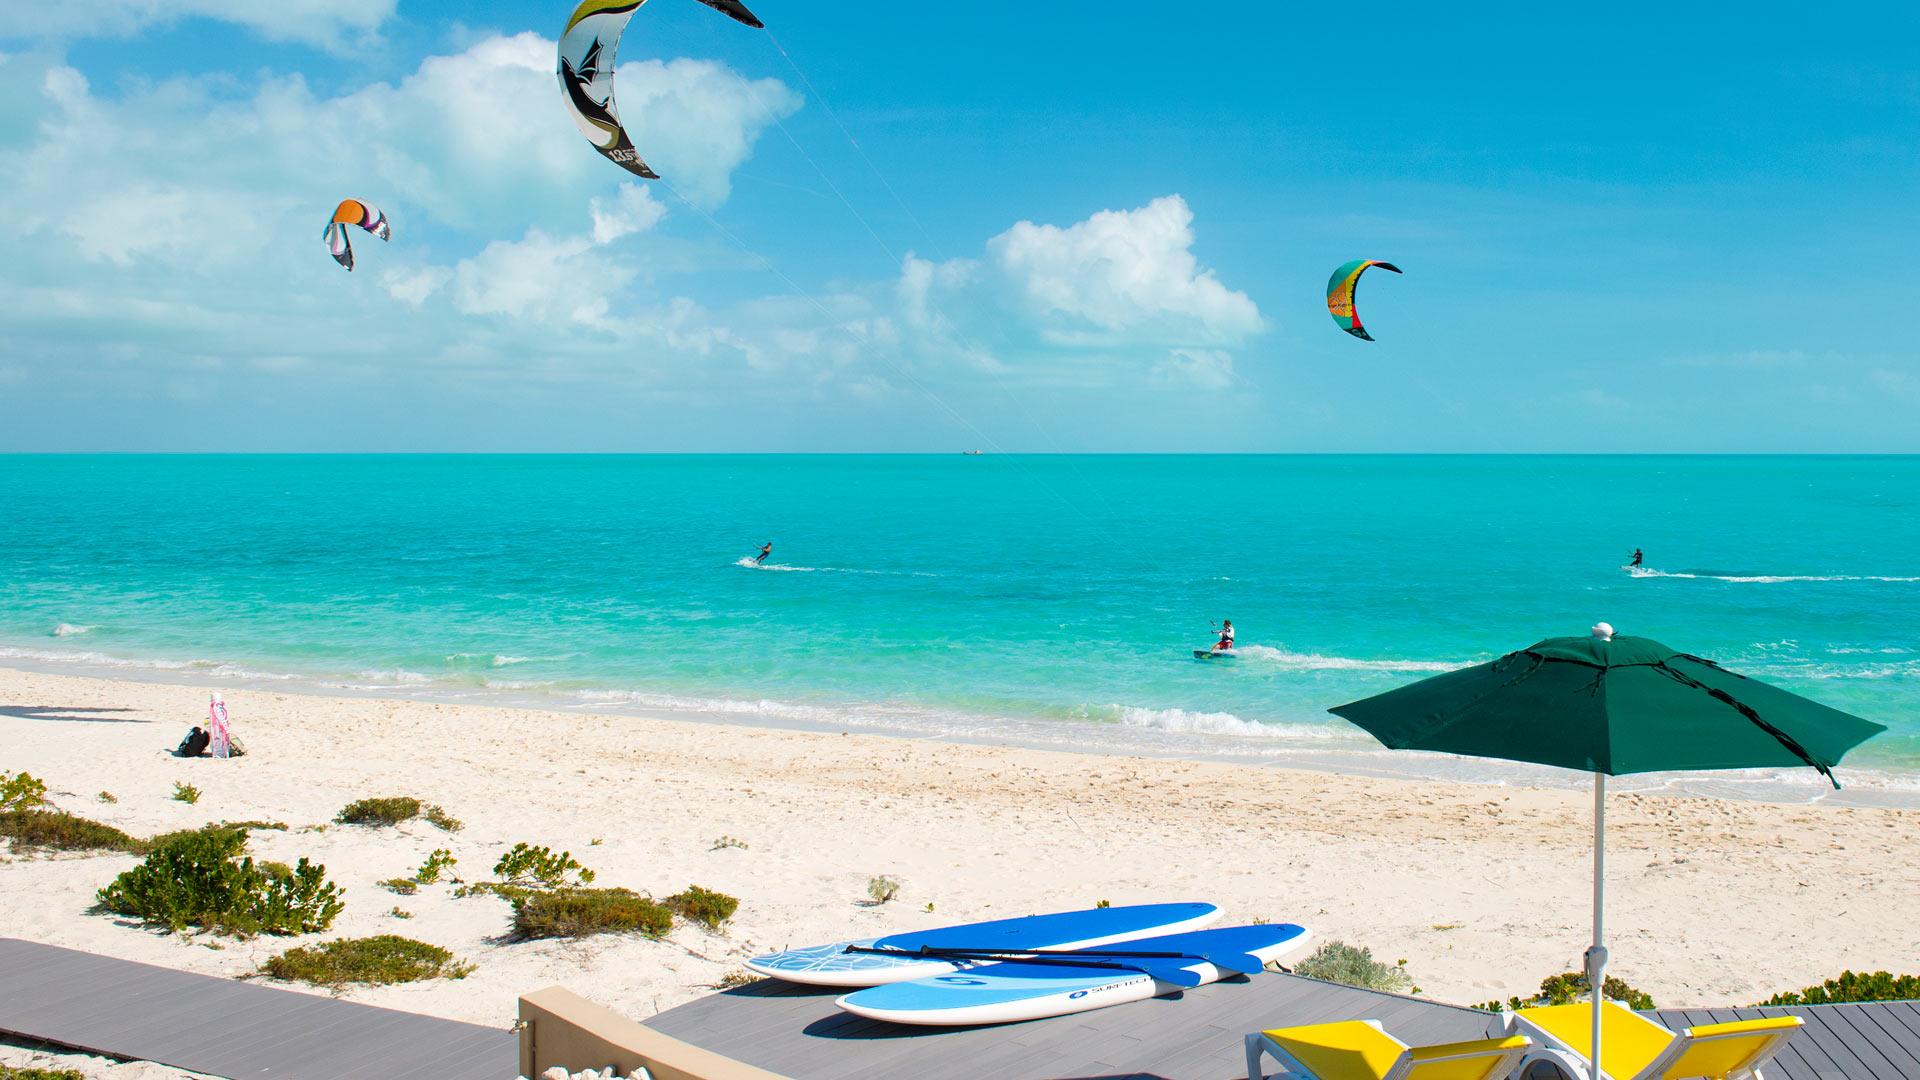 Windhaven Luxury Beach Villas Al Long Bay Turks And Caicos Enjoy Kiteboarding